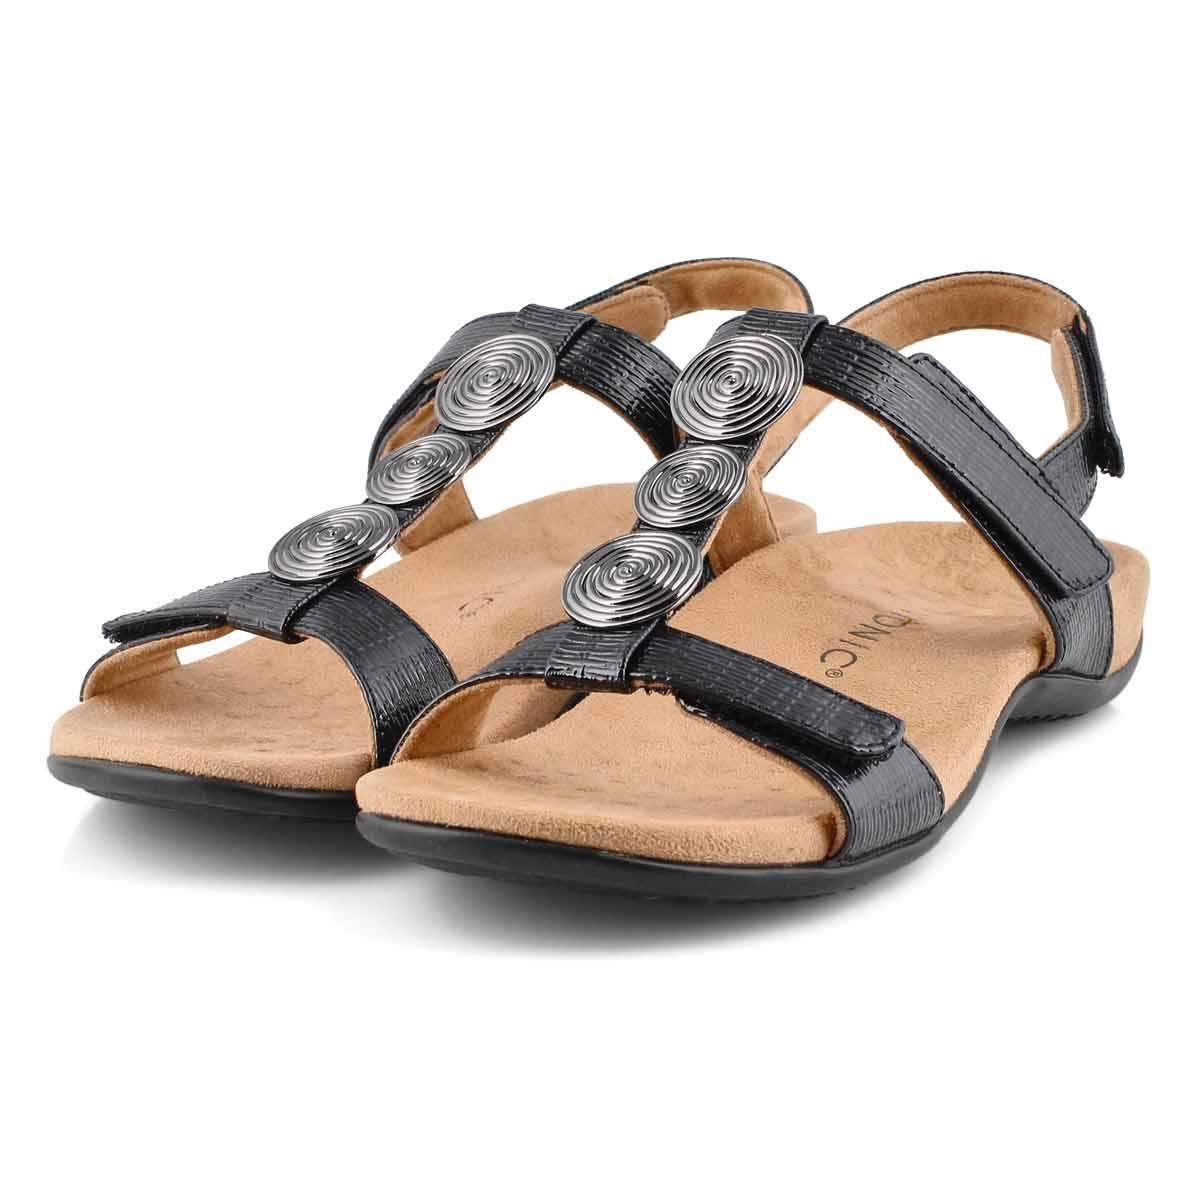 Lds Farra black arch support sandal